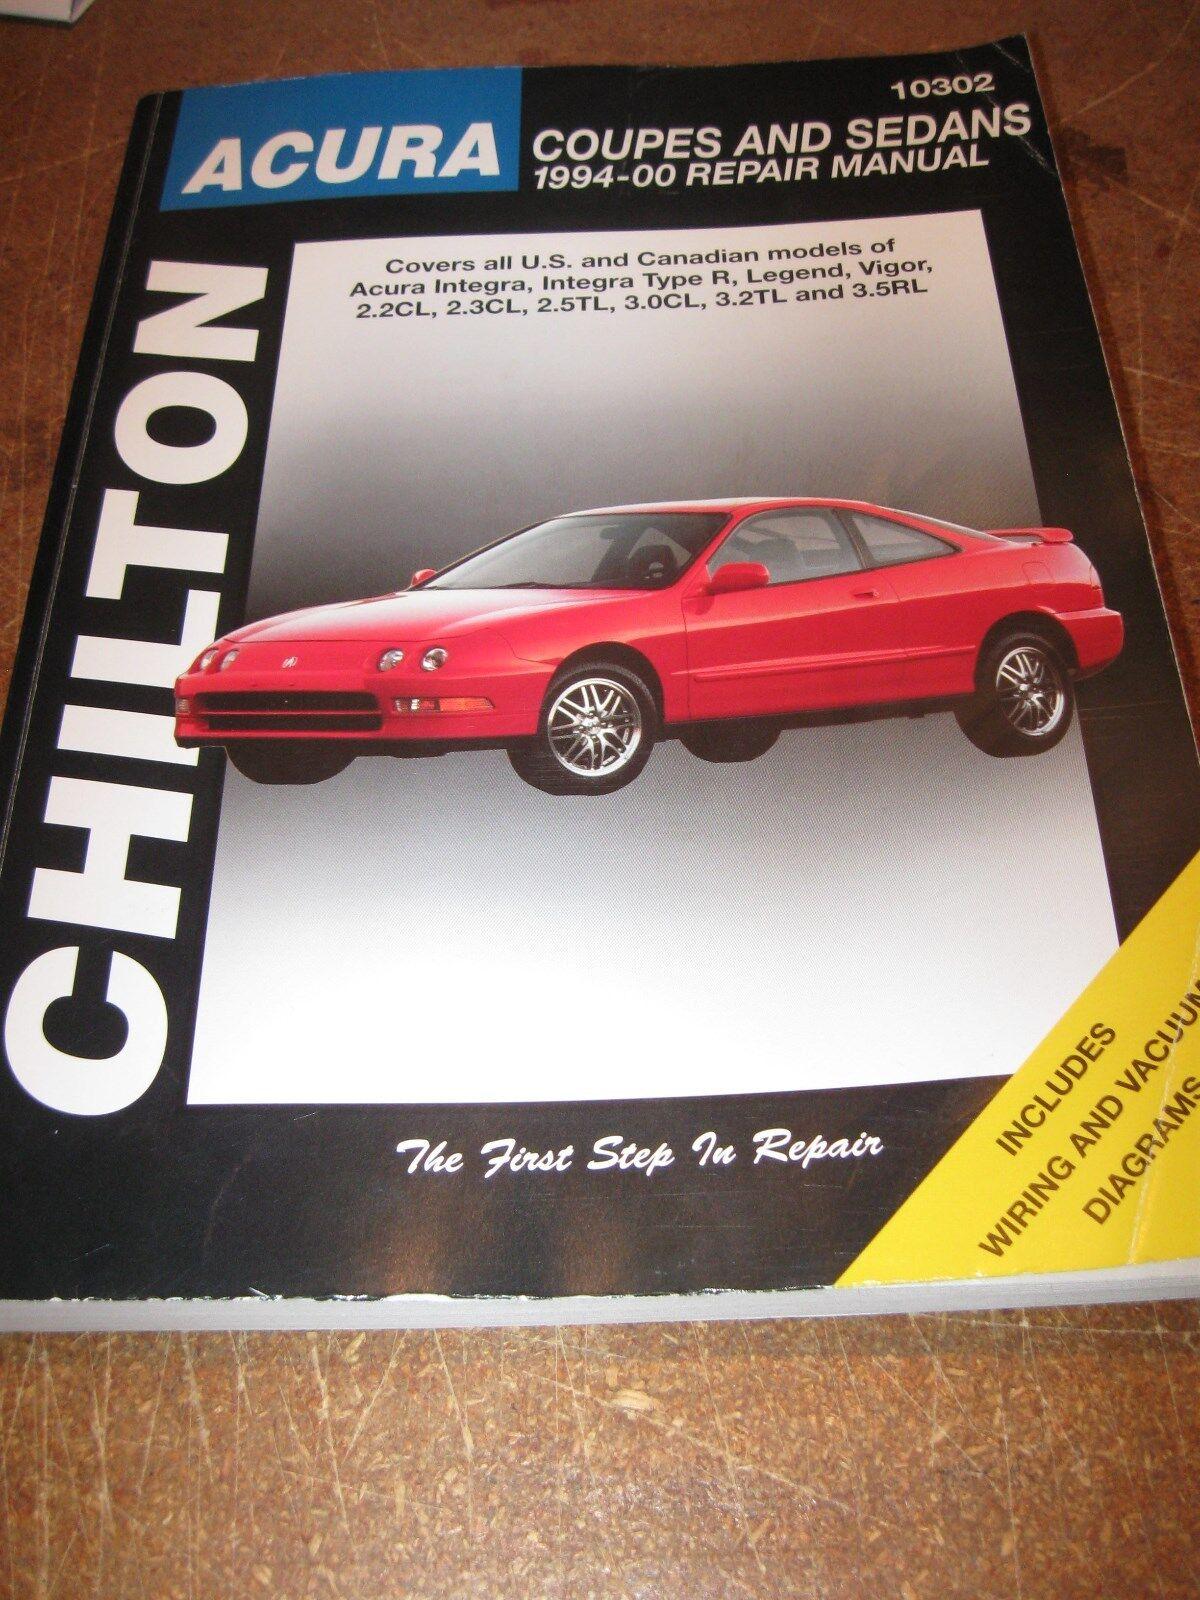 Chilton Acura Coupes Sedans 1994 - 2000 Repair Manual 10302 Integra Legend  Vigor   eBay